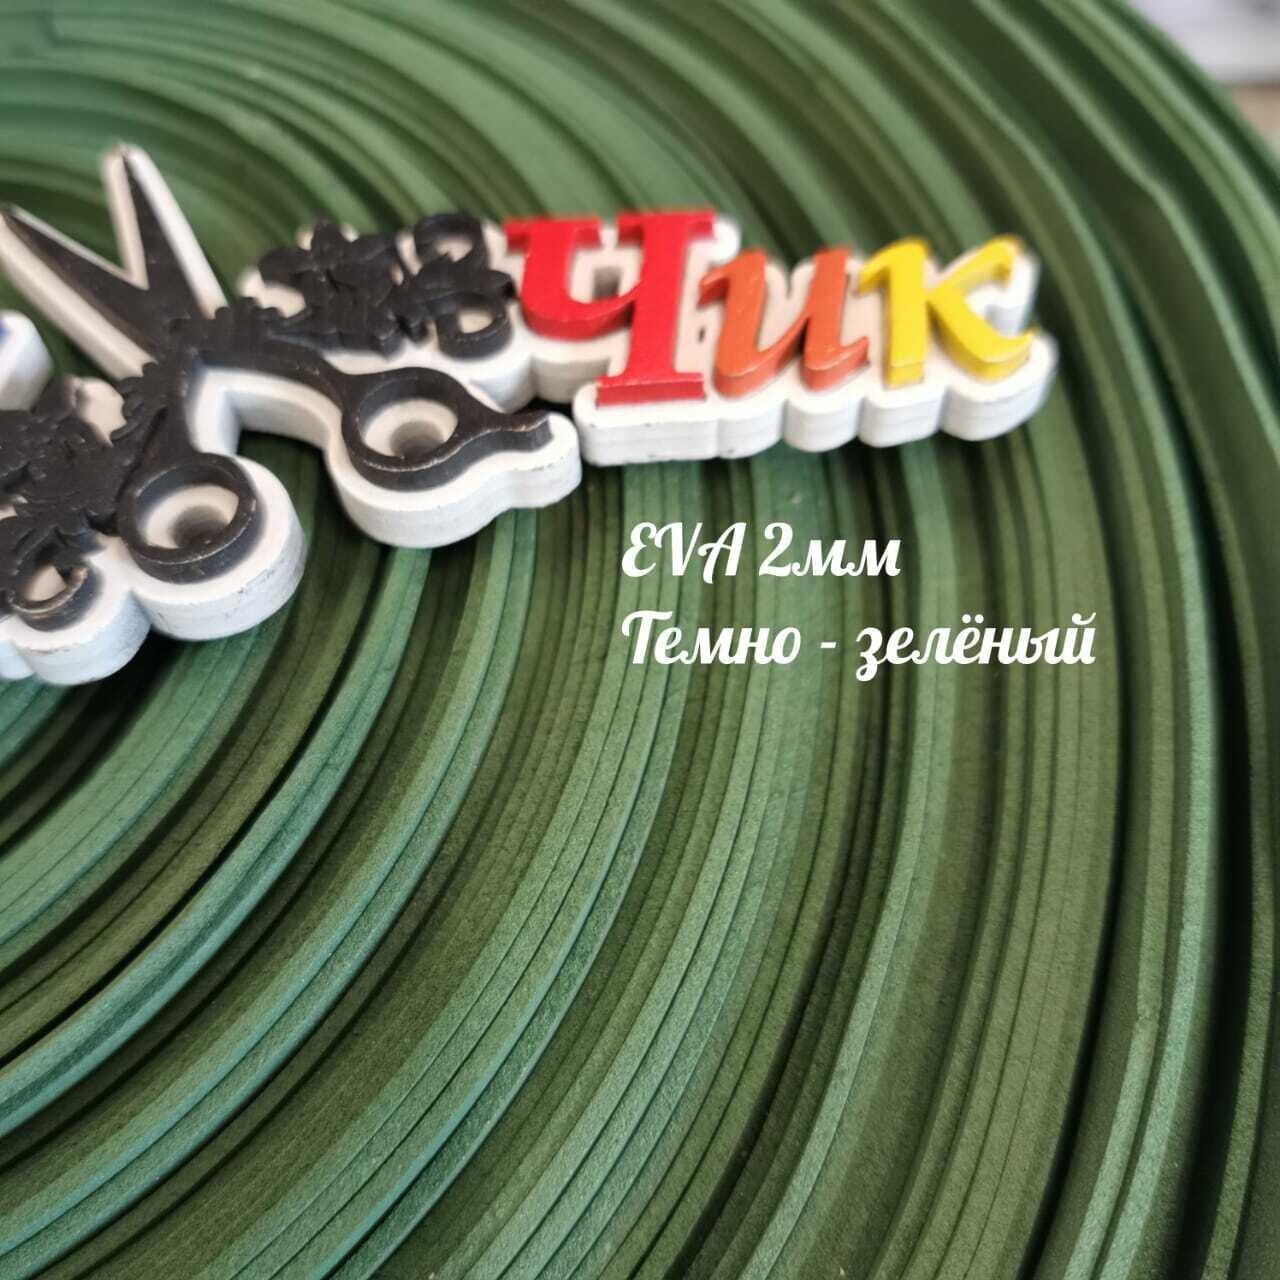 EVA ЛЮКС 2 мм в рулоне (Темно-зеленый)